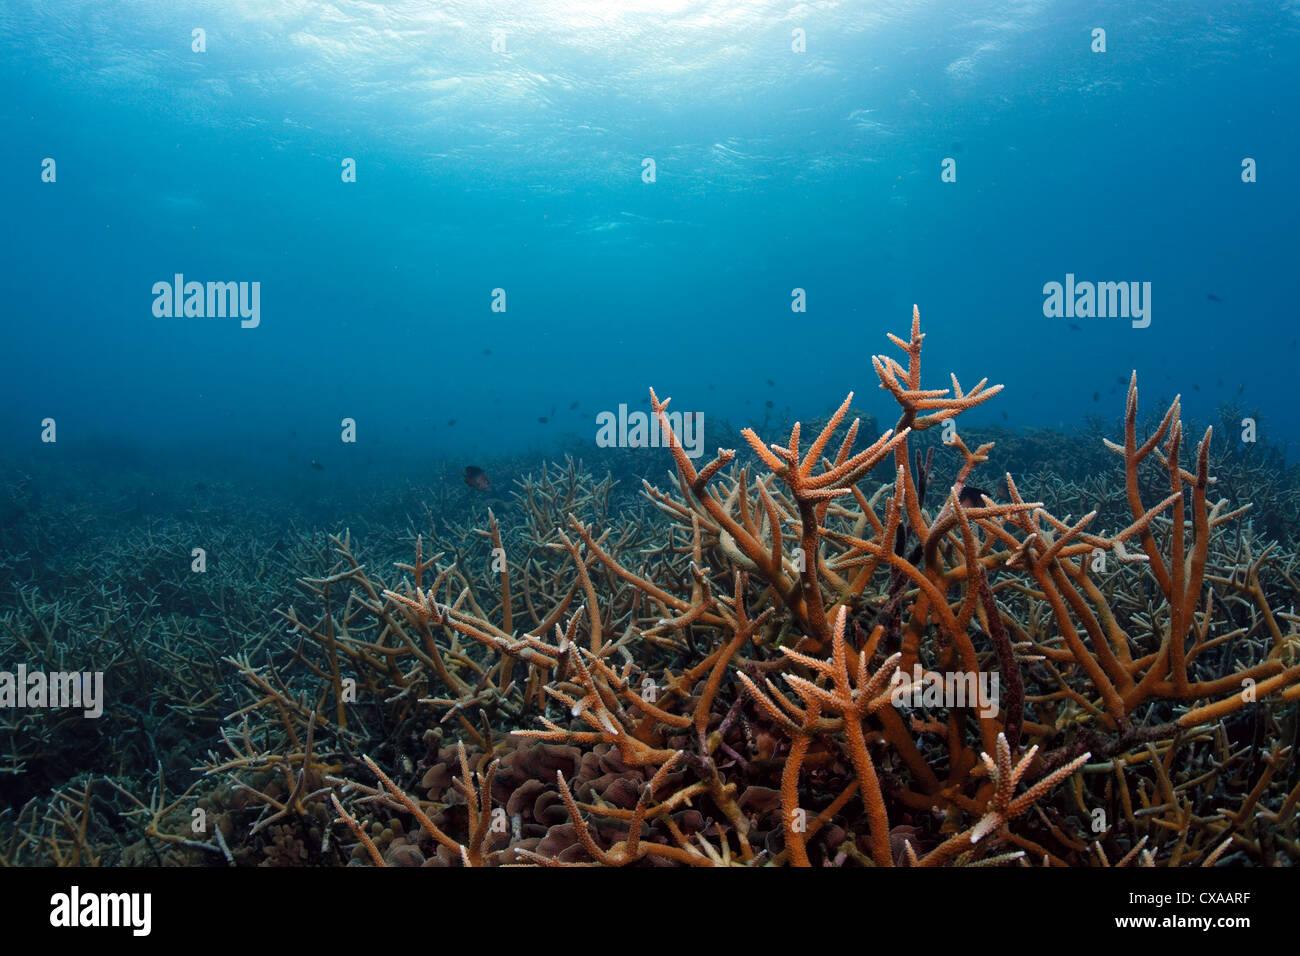 A coral reef at Cordelia Banks at the Swan Island off the coast of Honduras. - Stock Image